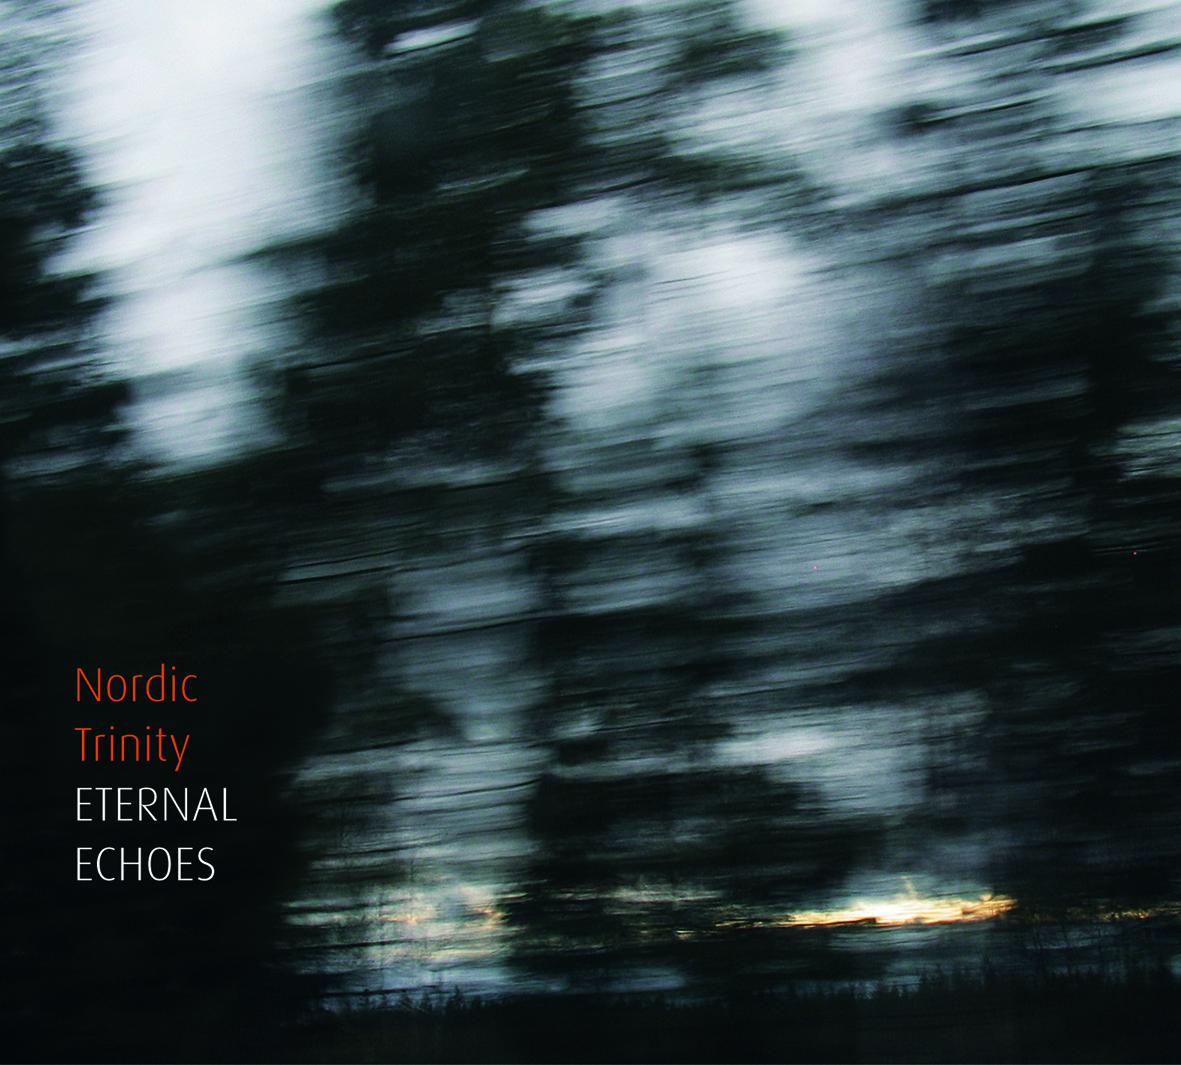 Nordic Trinity: Eternal Echoes